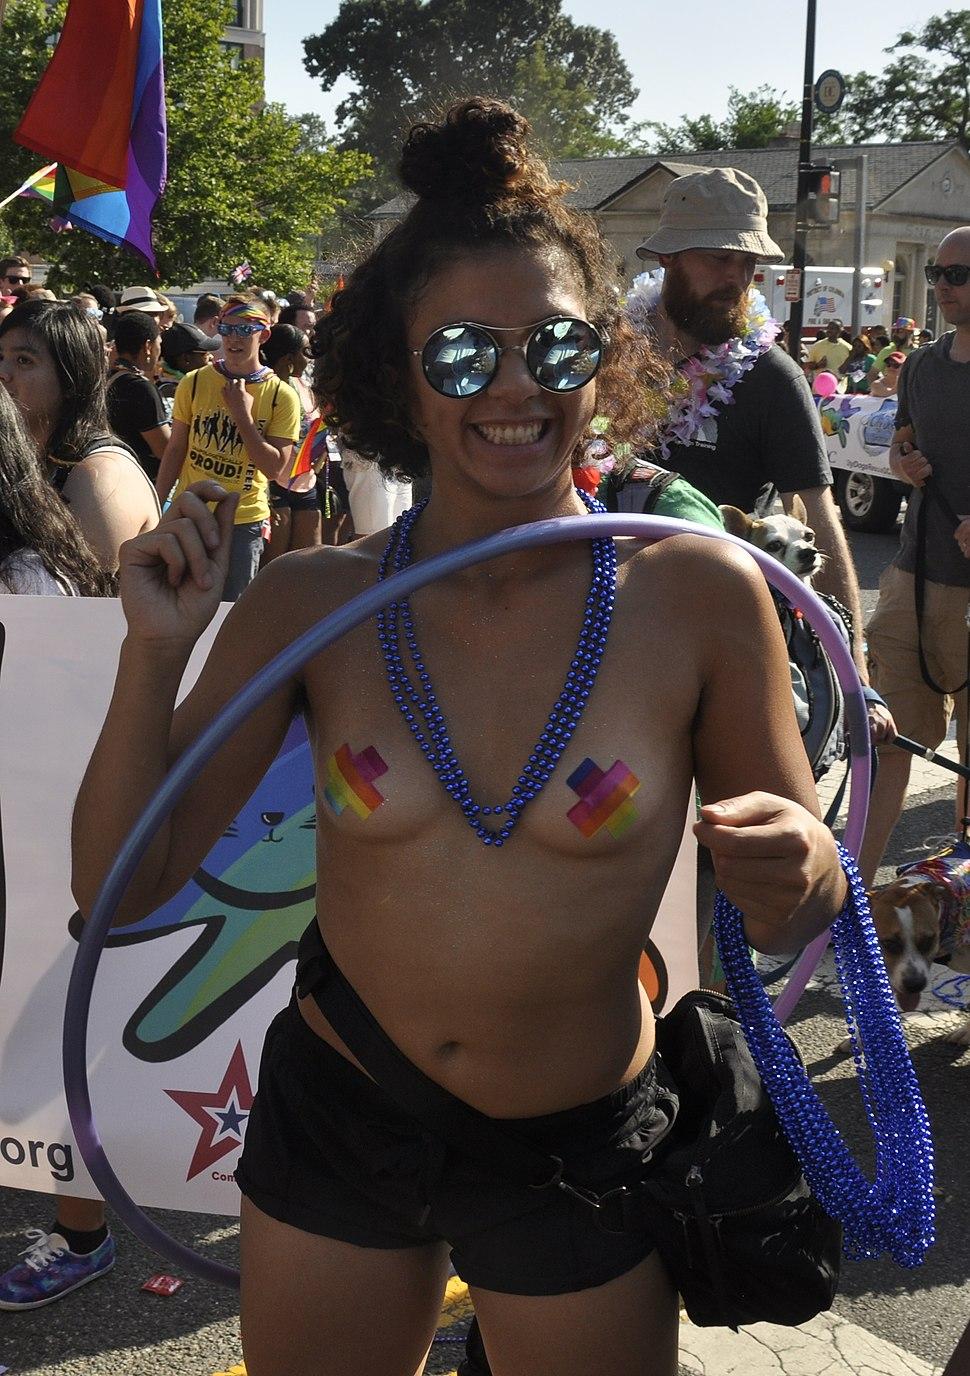 2017 Capital Pride (Washington, D.C.) - 027